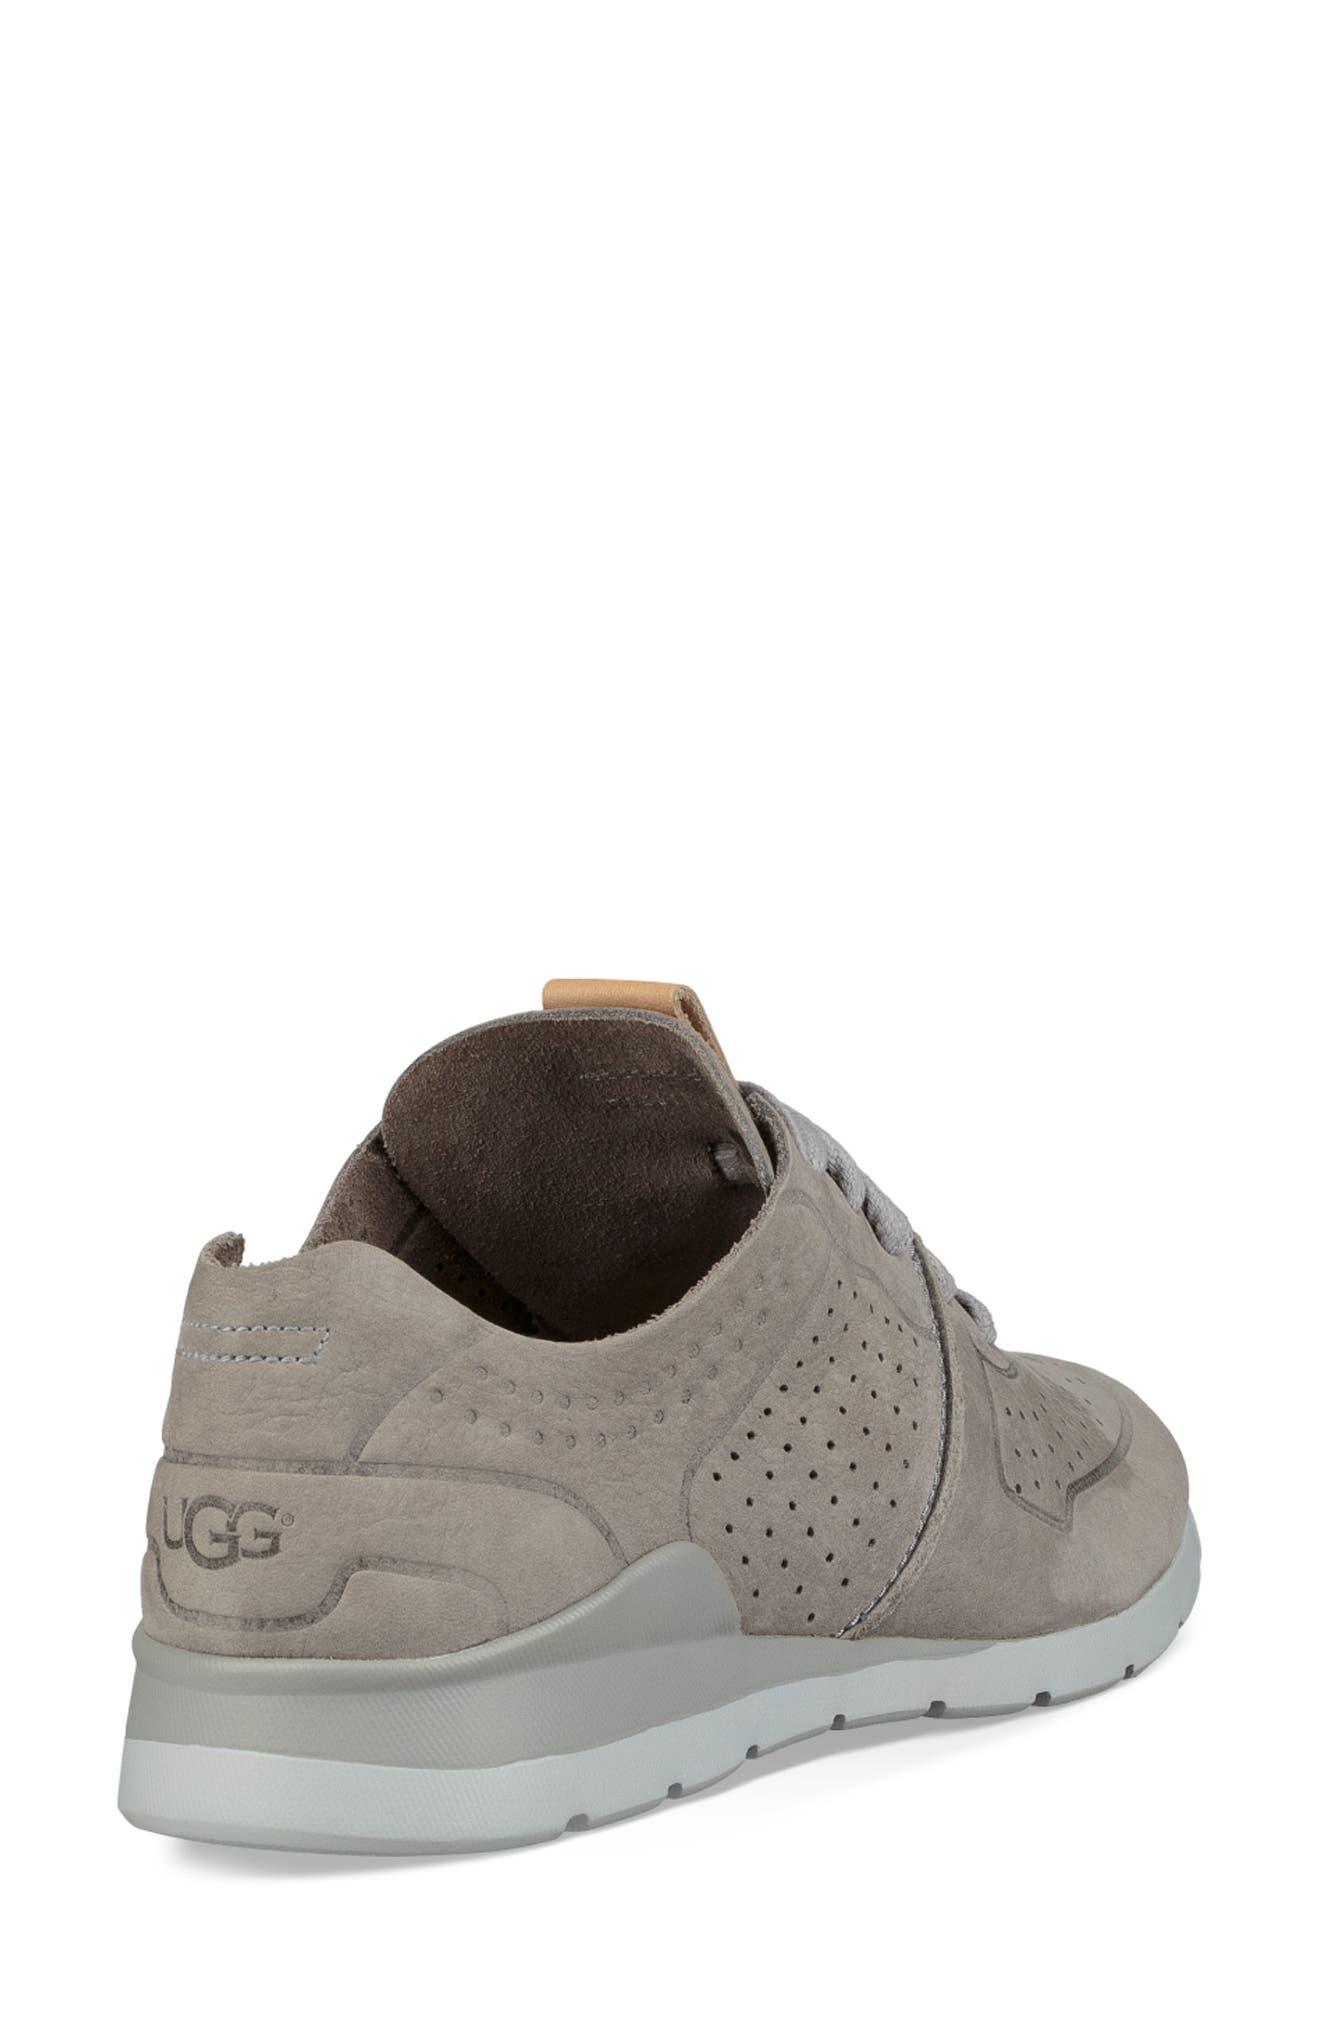 UGG<SUP>®</SUP>, Tye Sneaker, Alternate thumbnail 2, color, 024